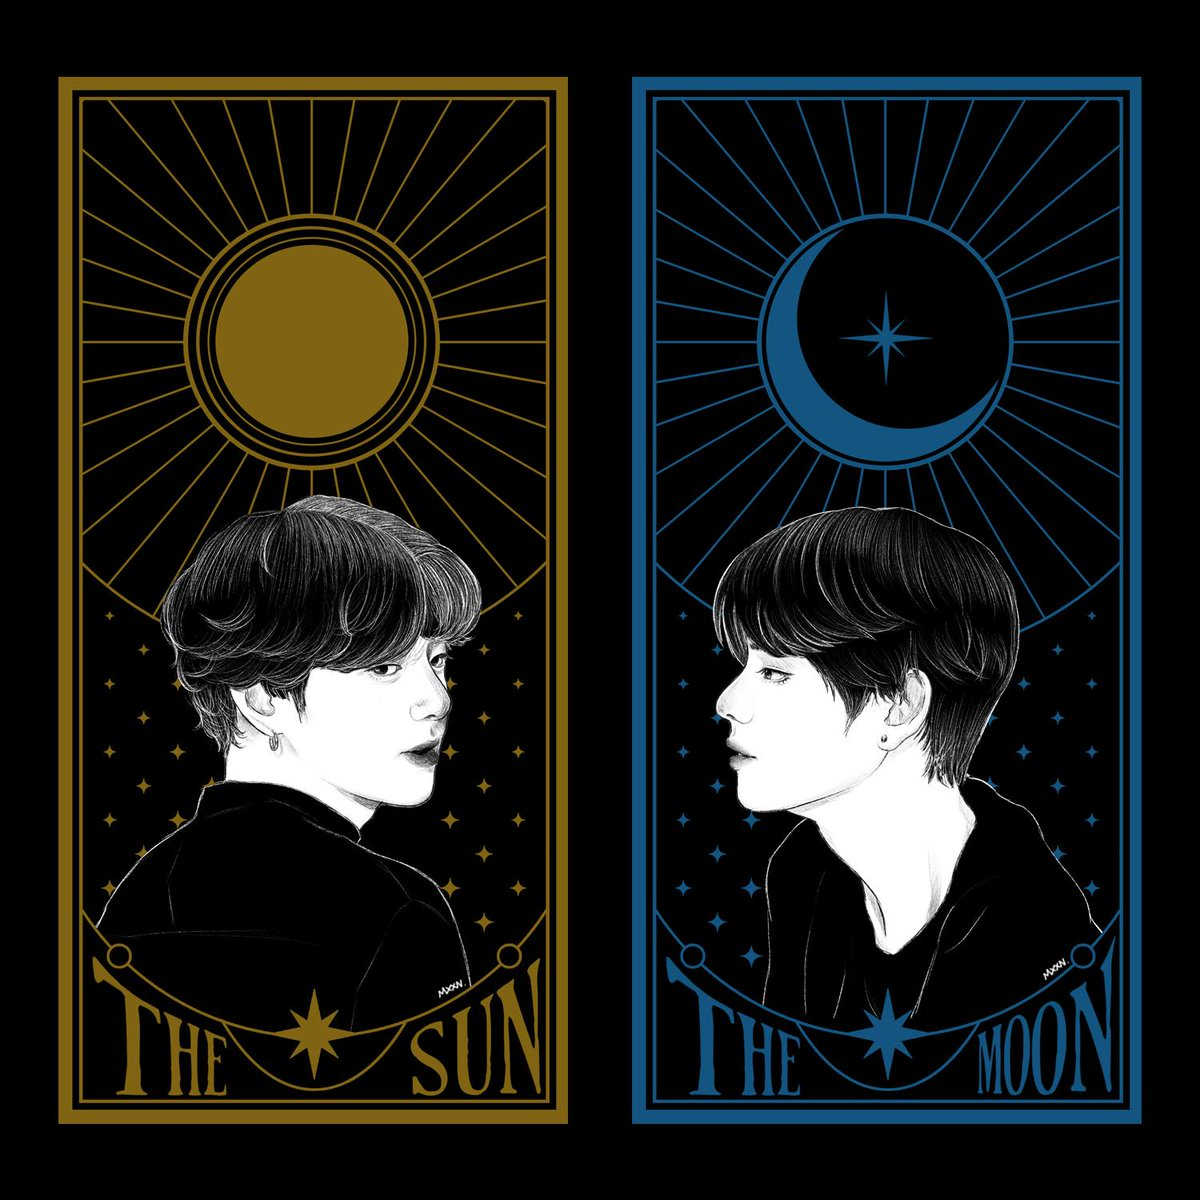 Destiny  #BTS #JK #V #TAEHYUNG #JUNGKOOK #sketch #design #illustration #art https://t.co/NKeXWQRar0